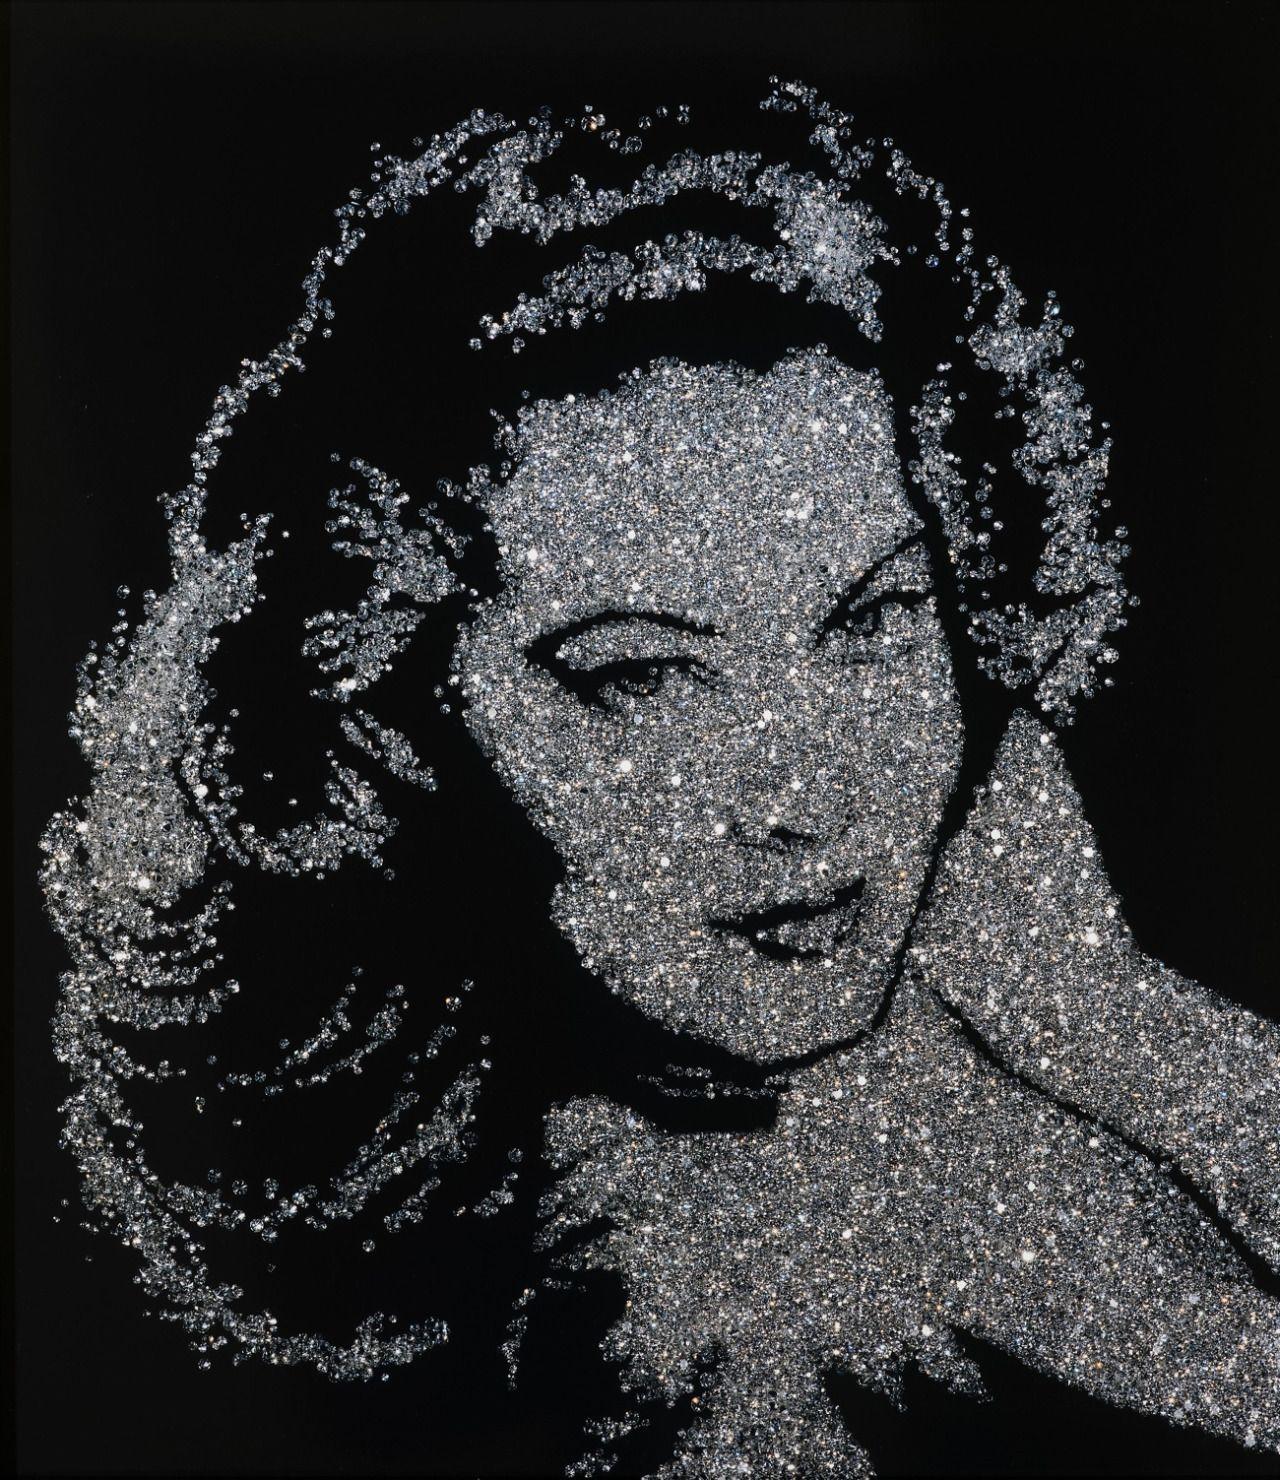 Vik Muniz (Brazilian, b. 1961) Ava Gardner (From Pictures of Diamonds), 2005